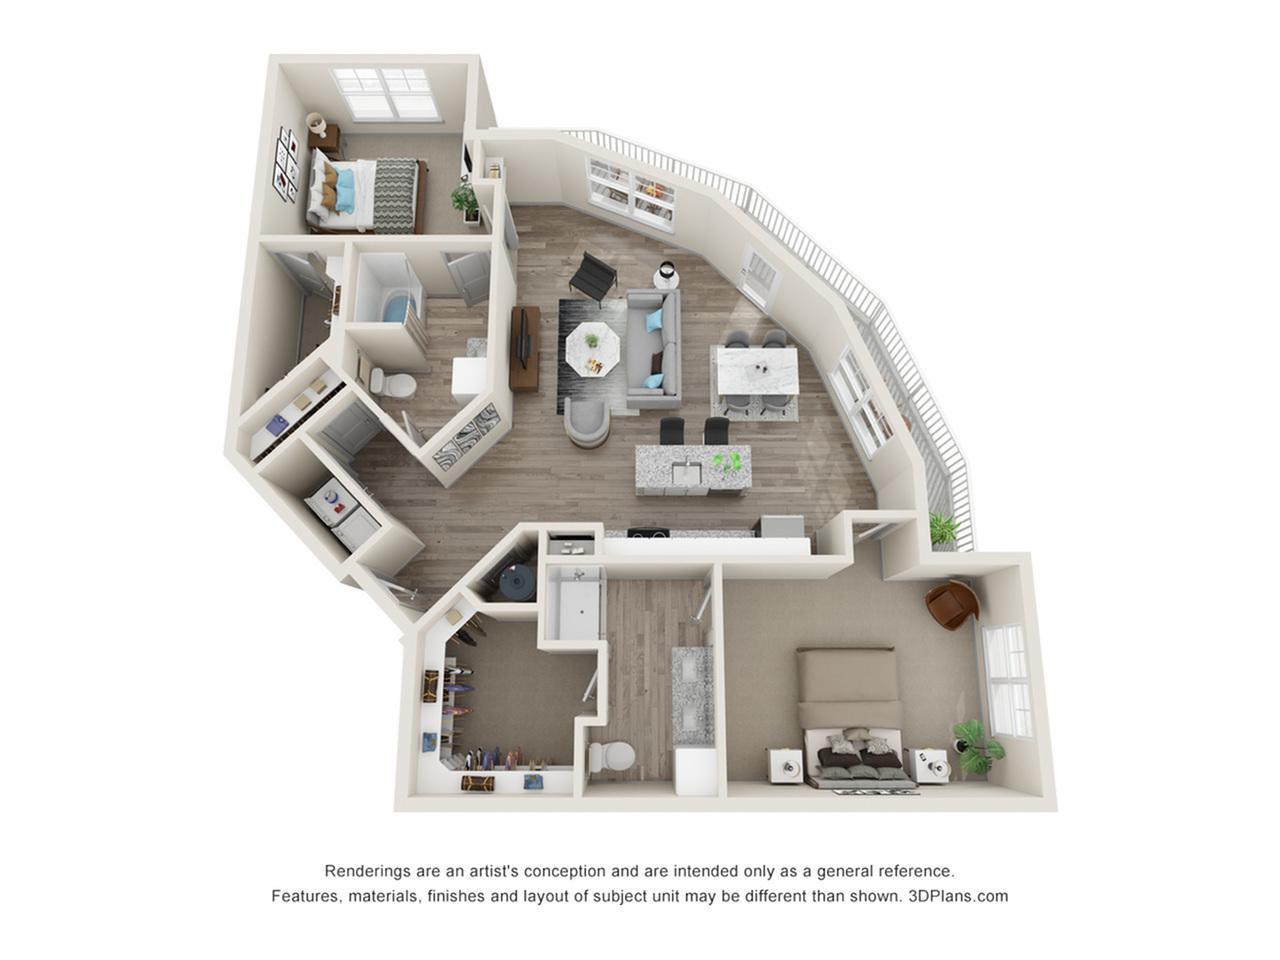 fringe-floor-plan-2-bed-2-bath